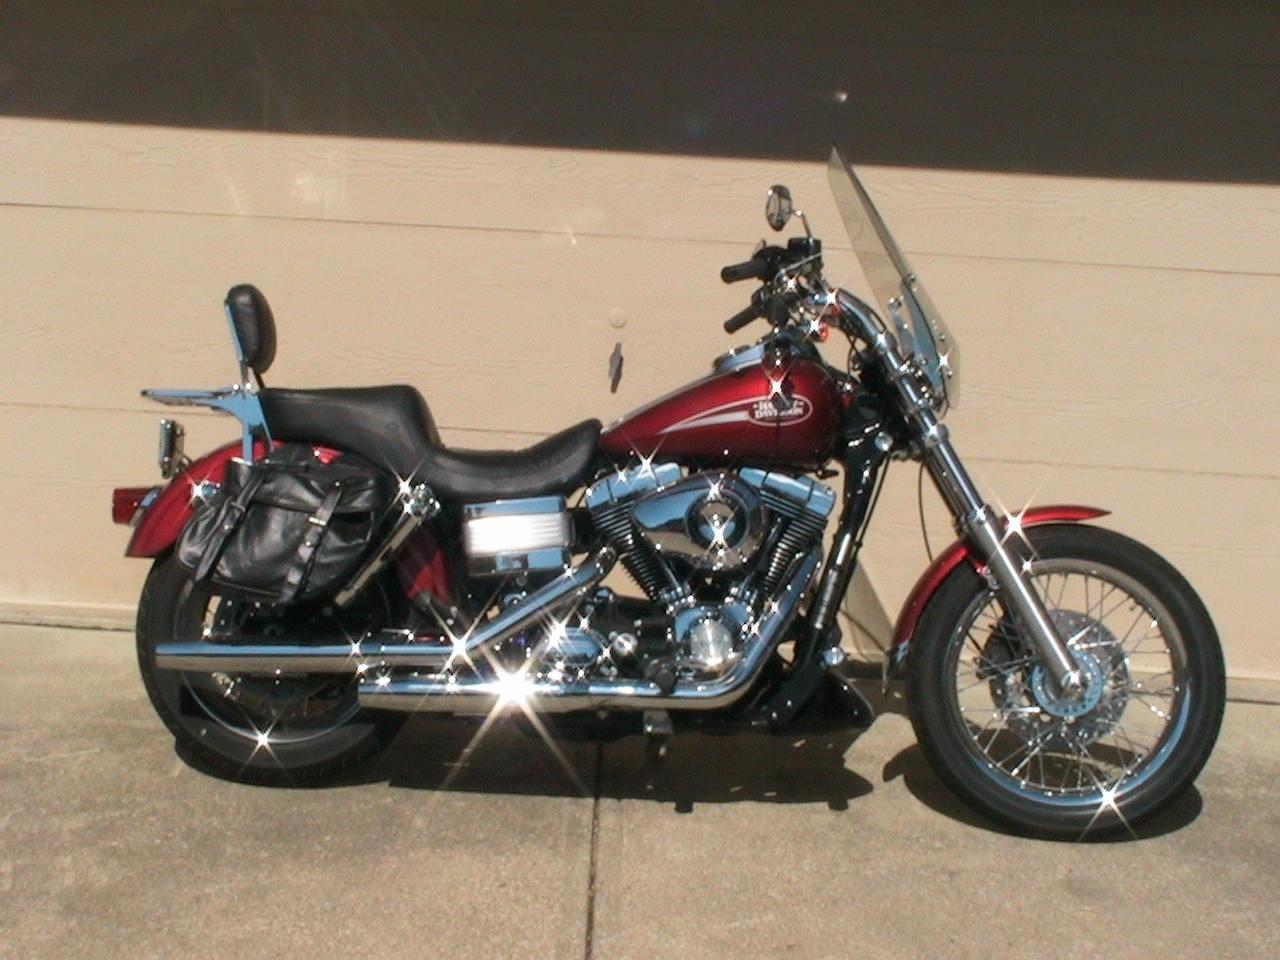 Low Rider S 117CI Street Beast For Sale - Harley-Davidson Cruiser